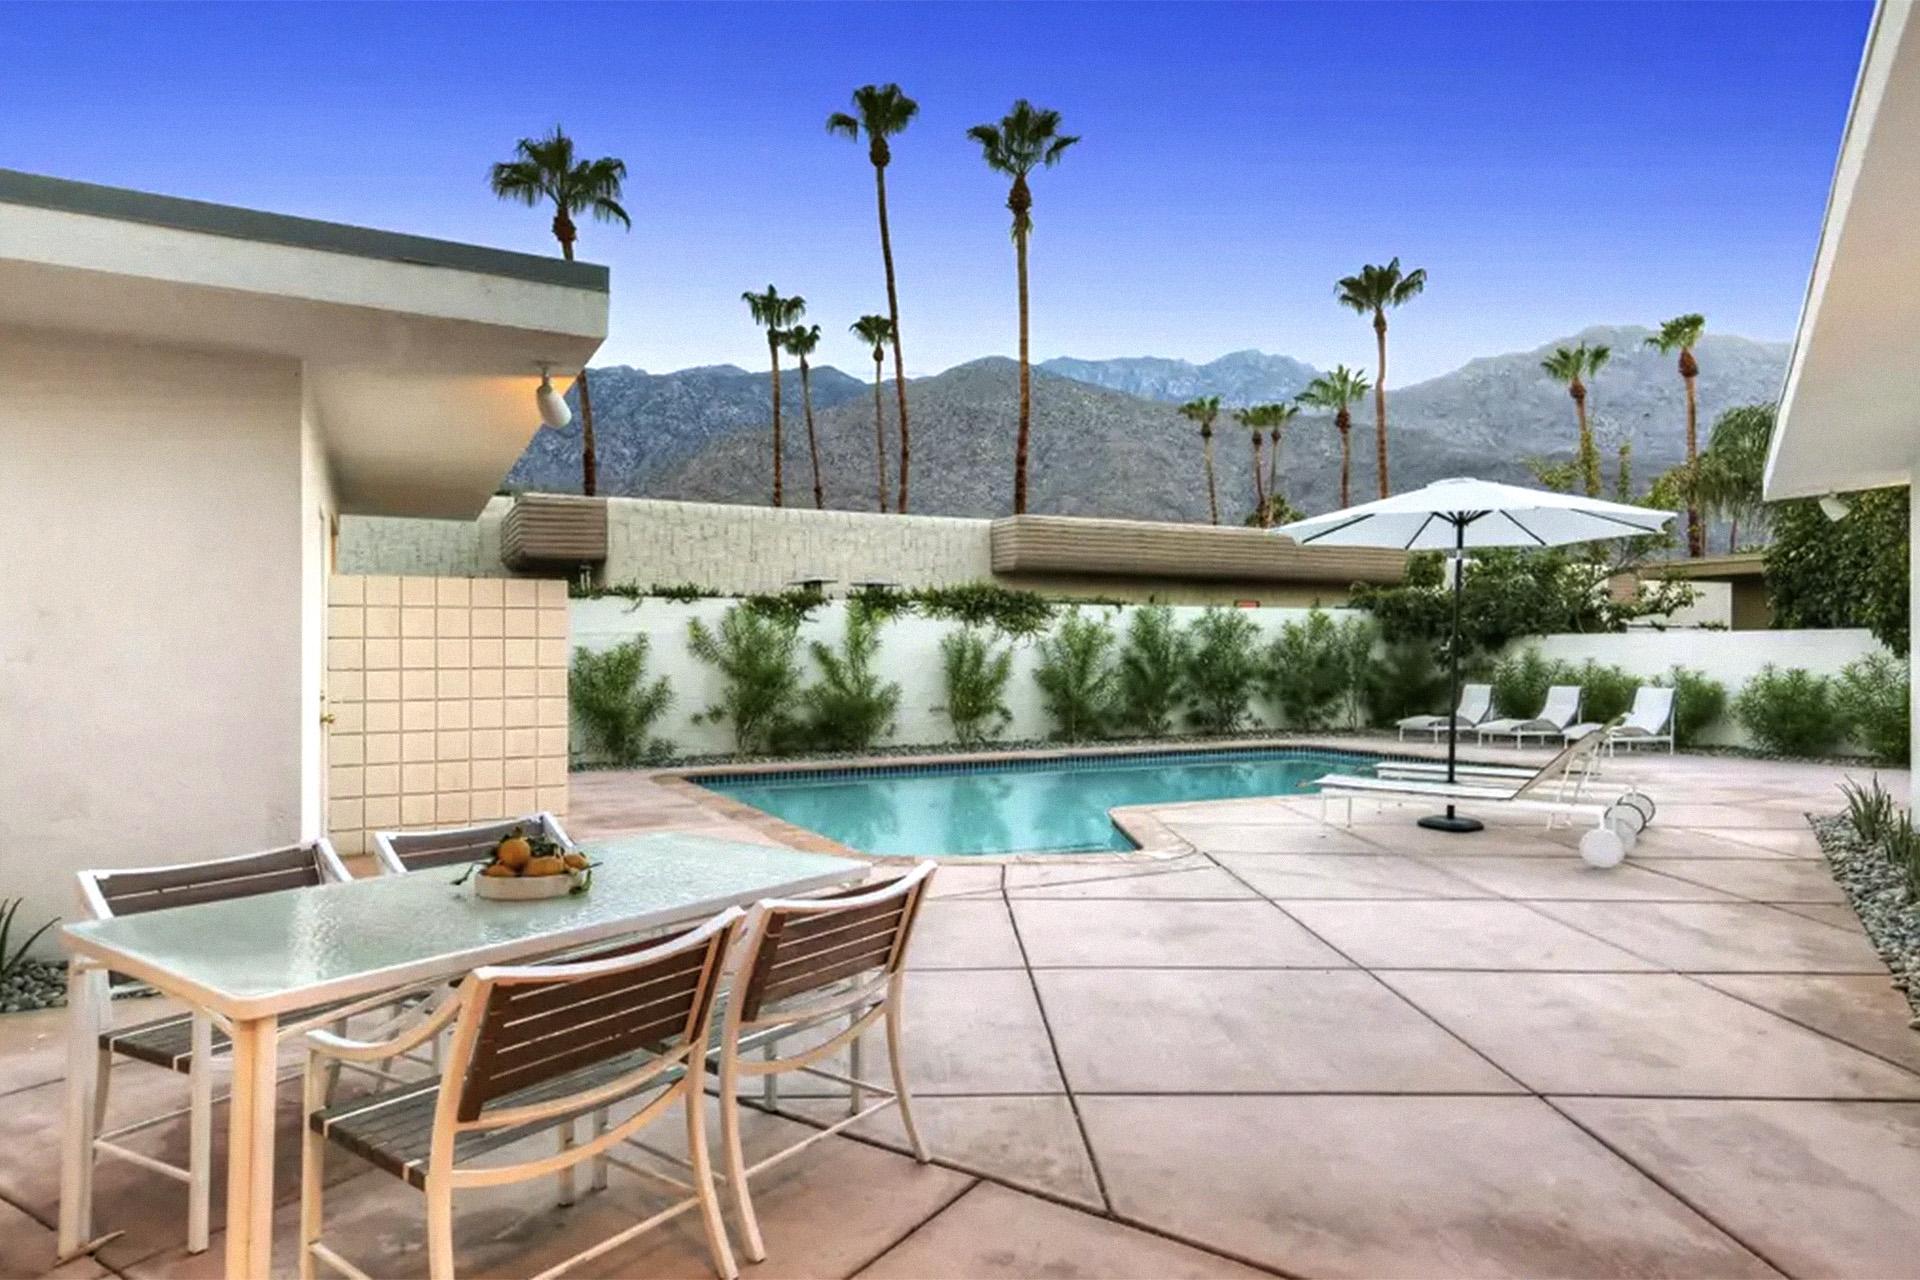 Image of: 11 Amazing Mid Century Airbnb Rentals On The West Coast Mid Mod Mango